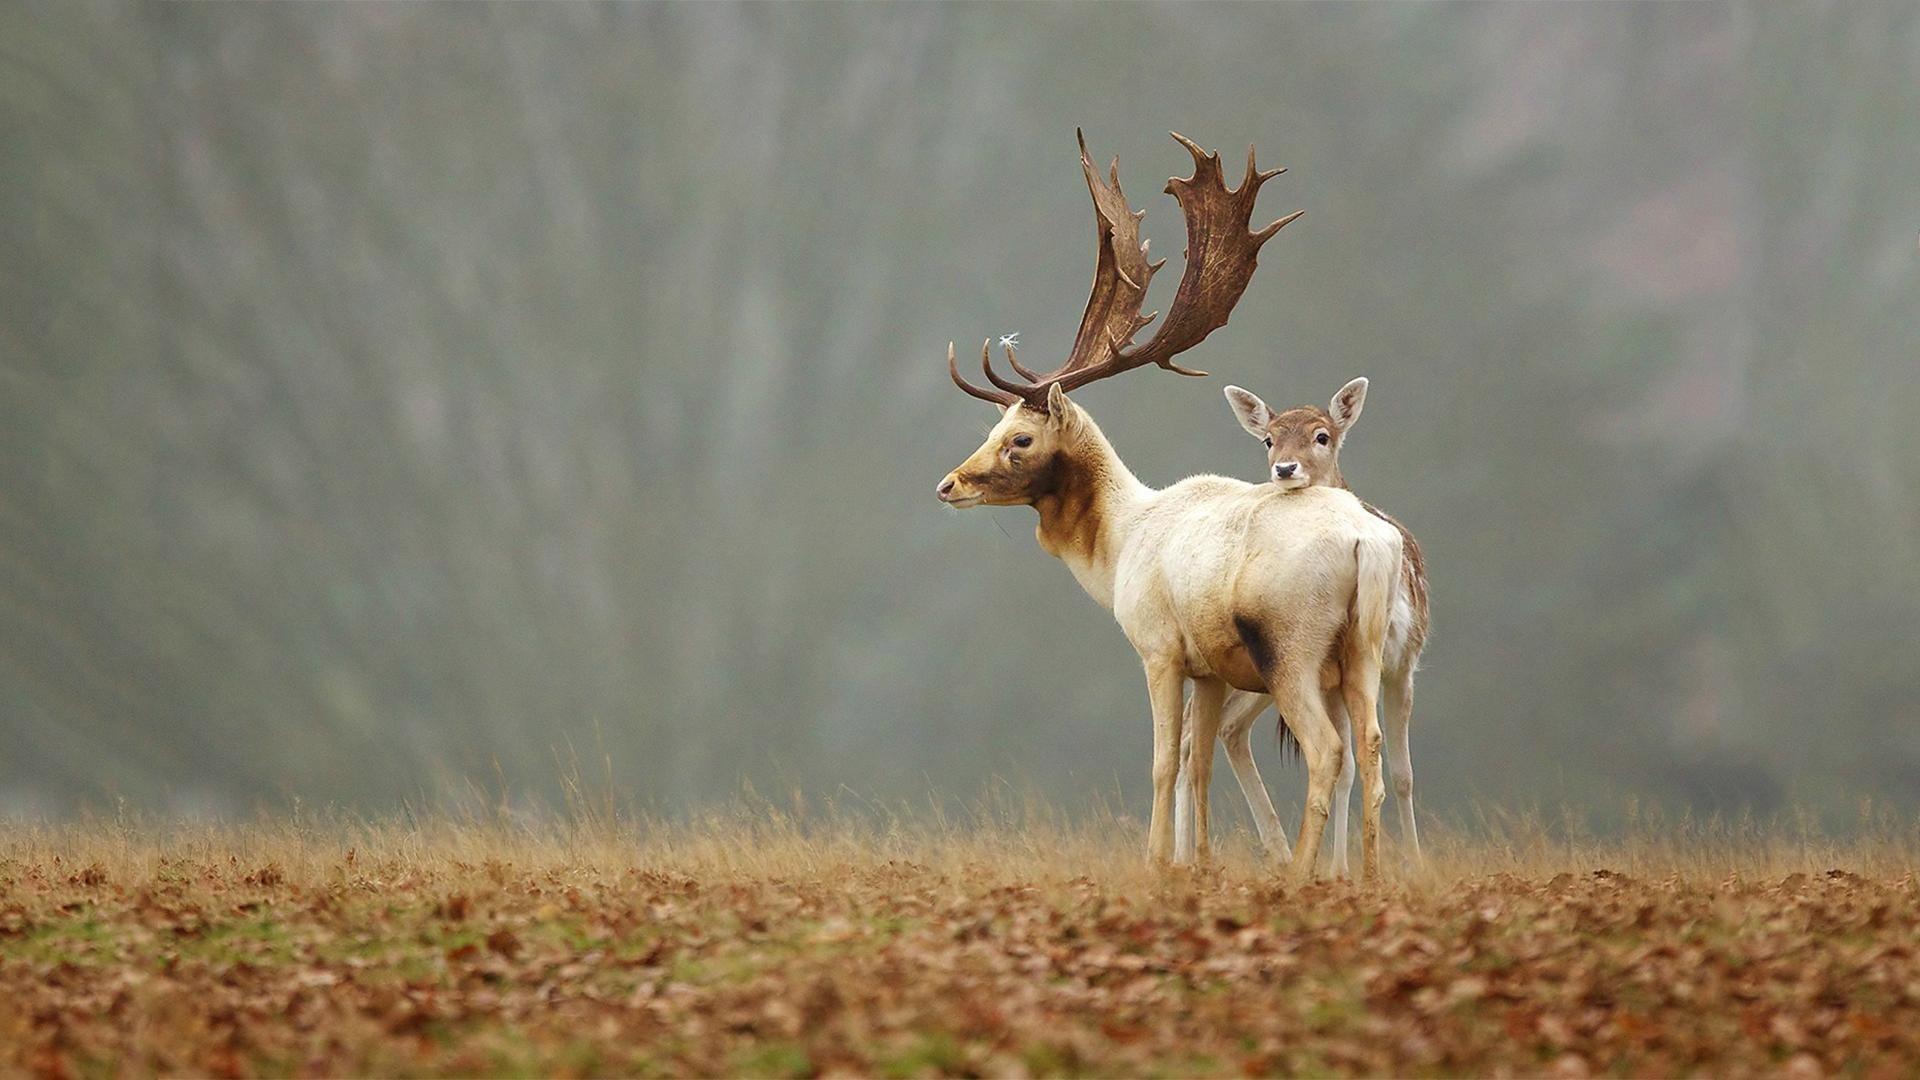 Wallpaper Nature Wildlife Elk Baby Animals Fawns Grassland Fauna Mammal Horn Prairie